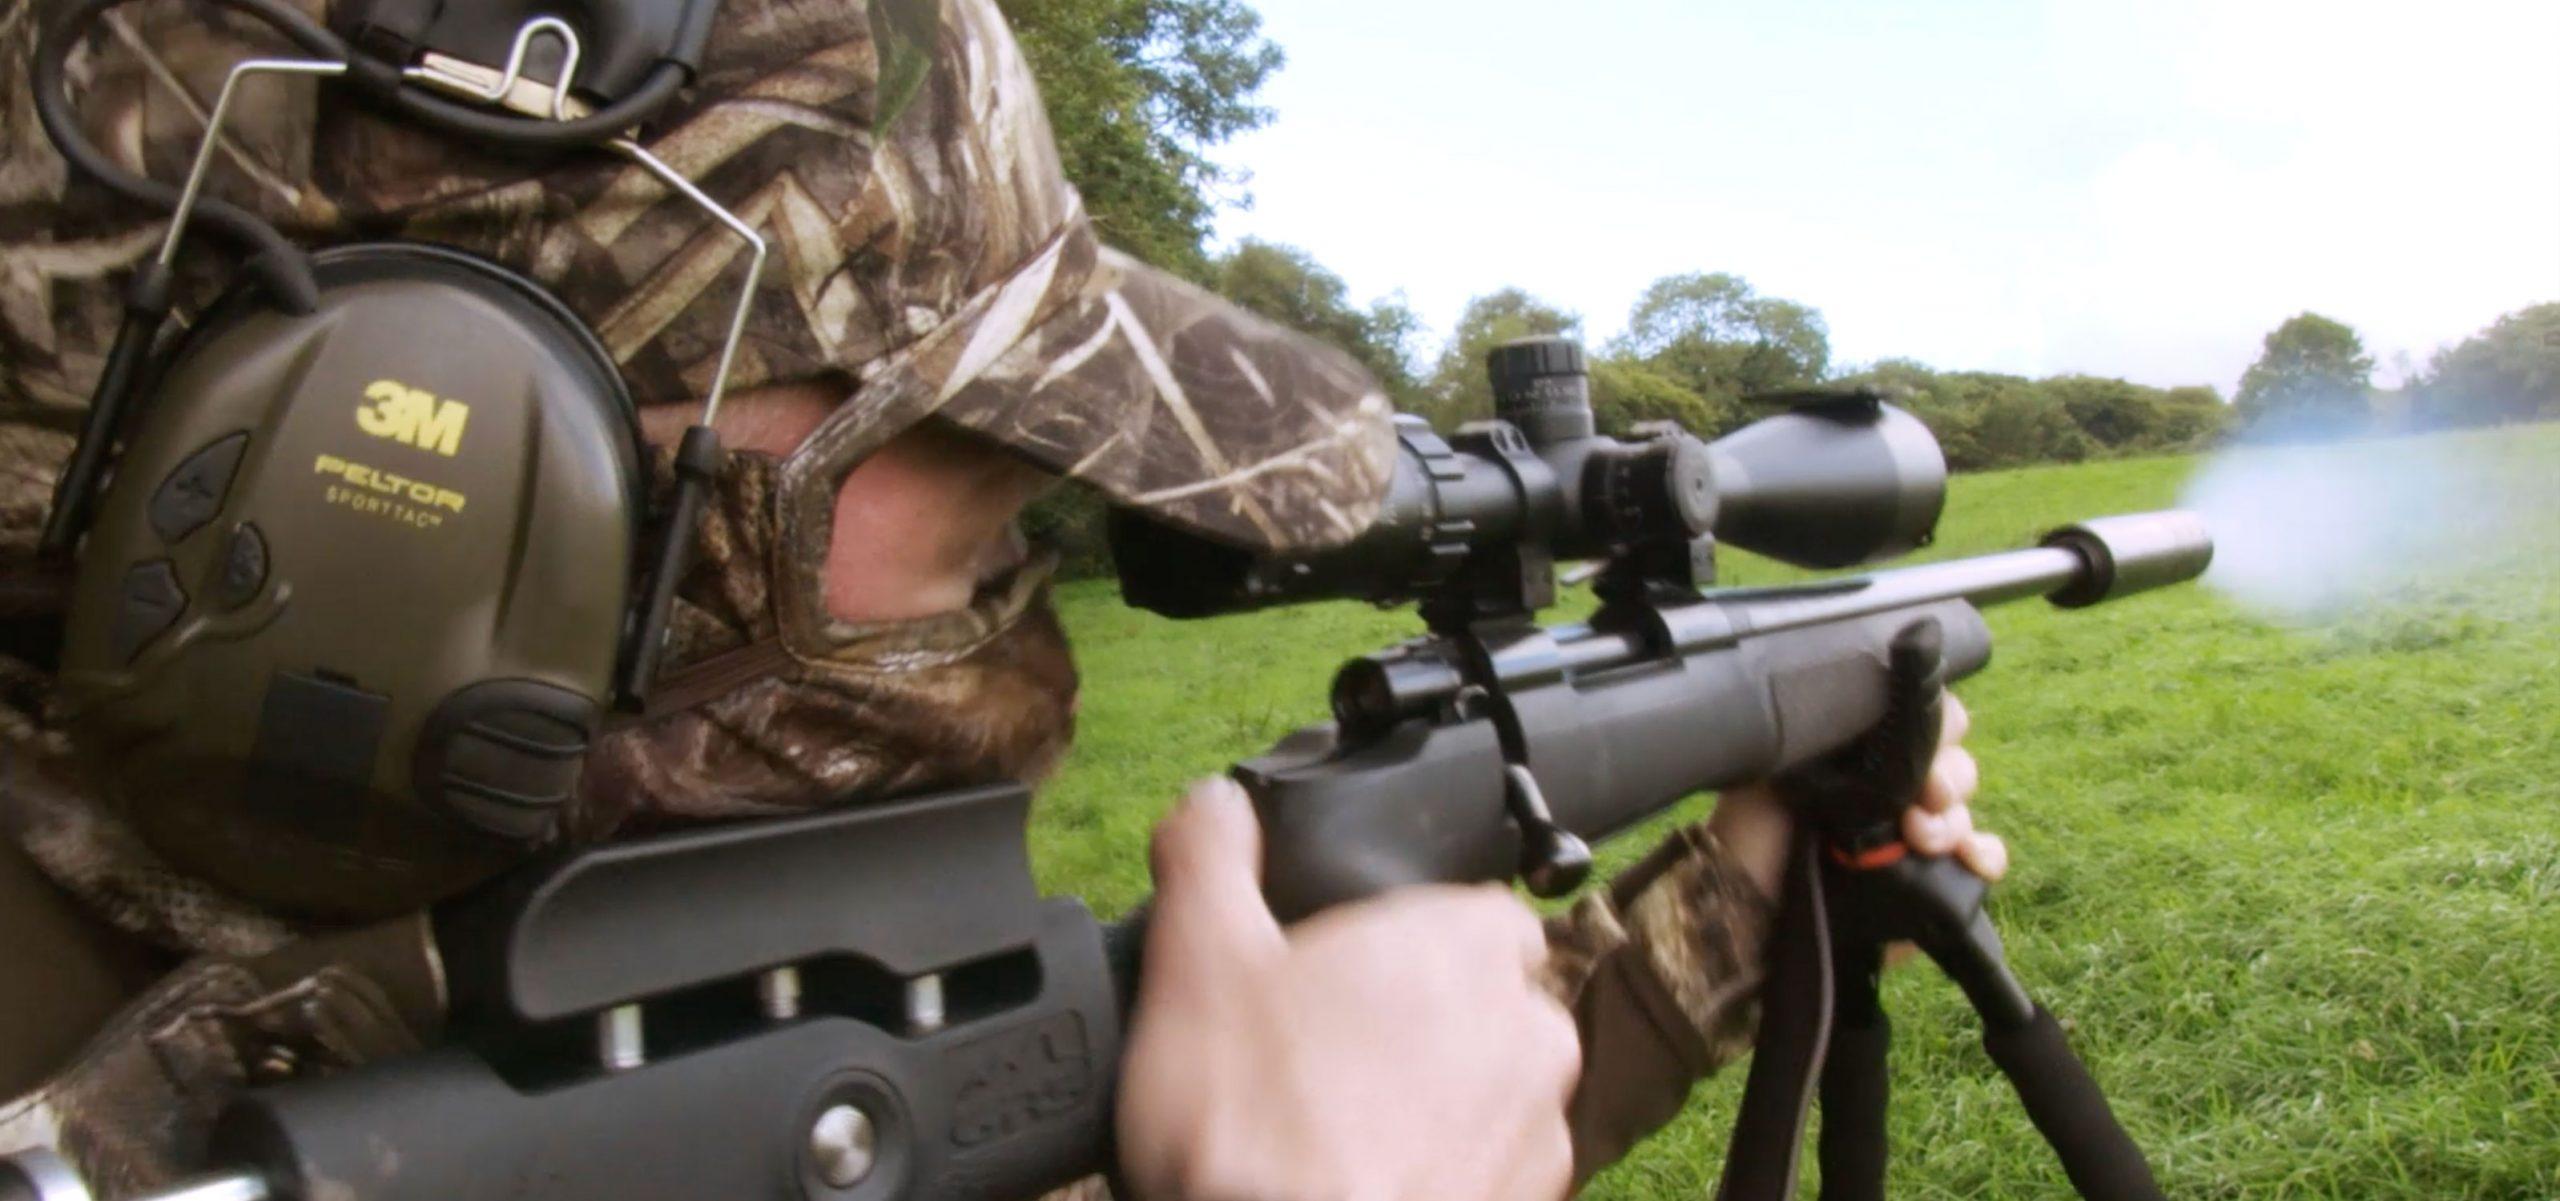 Essential Equipment for Deer Stalking